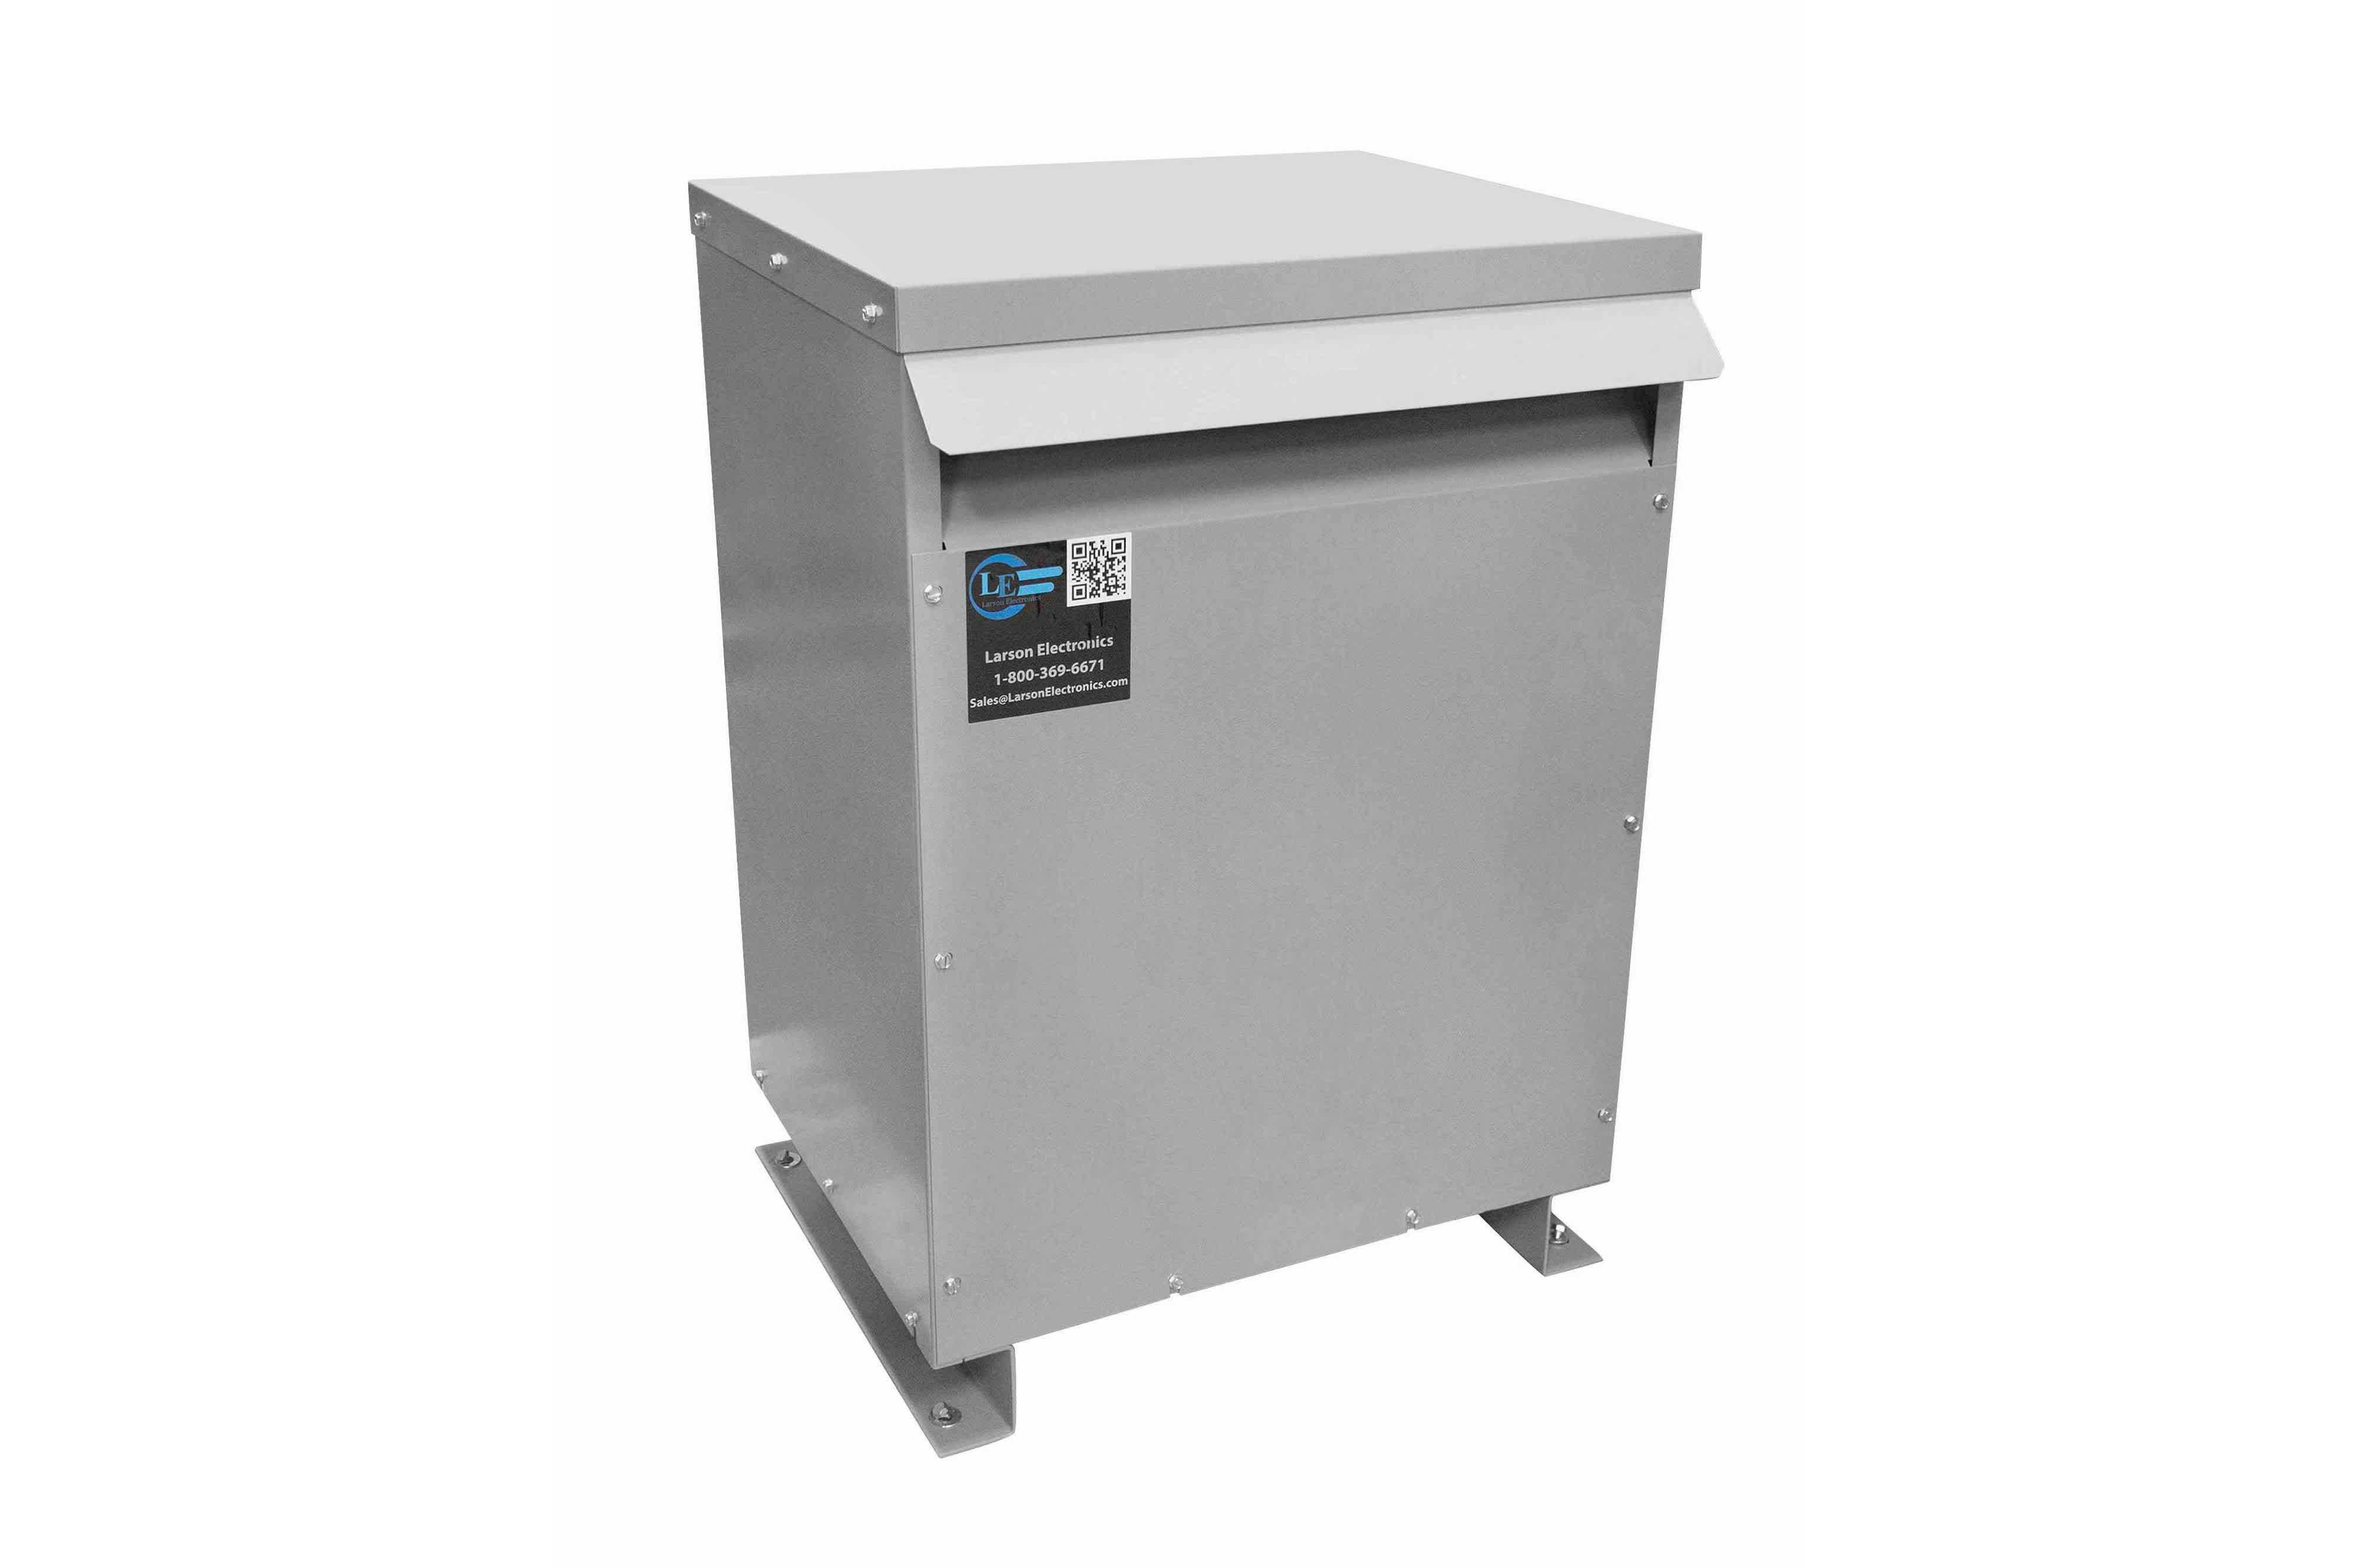 100 kVA 3PH Isolation Transformer, 380V Wye Primary, 480Y/277 Wye-N Secondary, N3R, Ventilated, 60 Hz